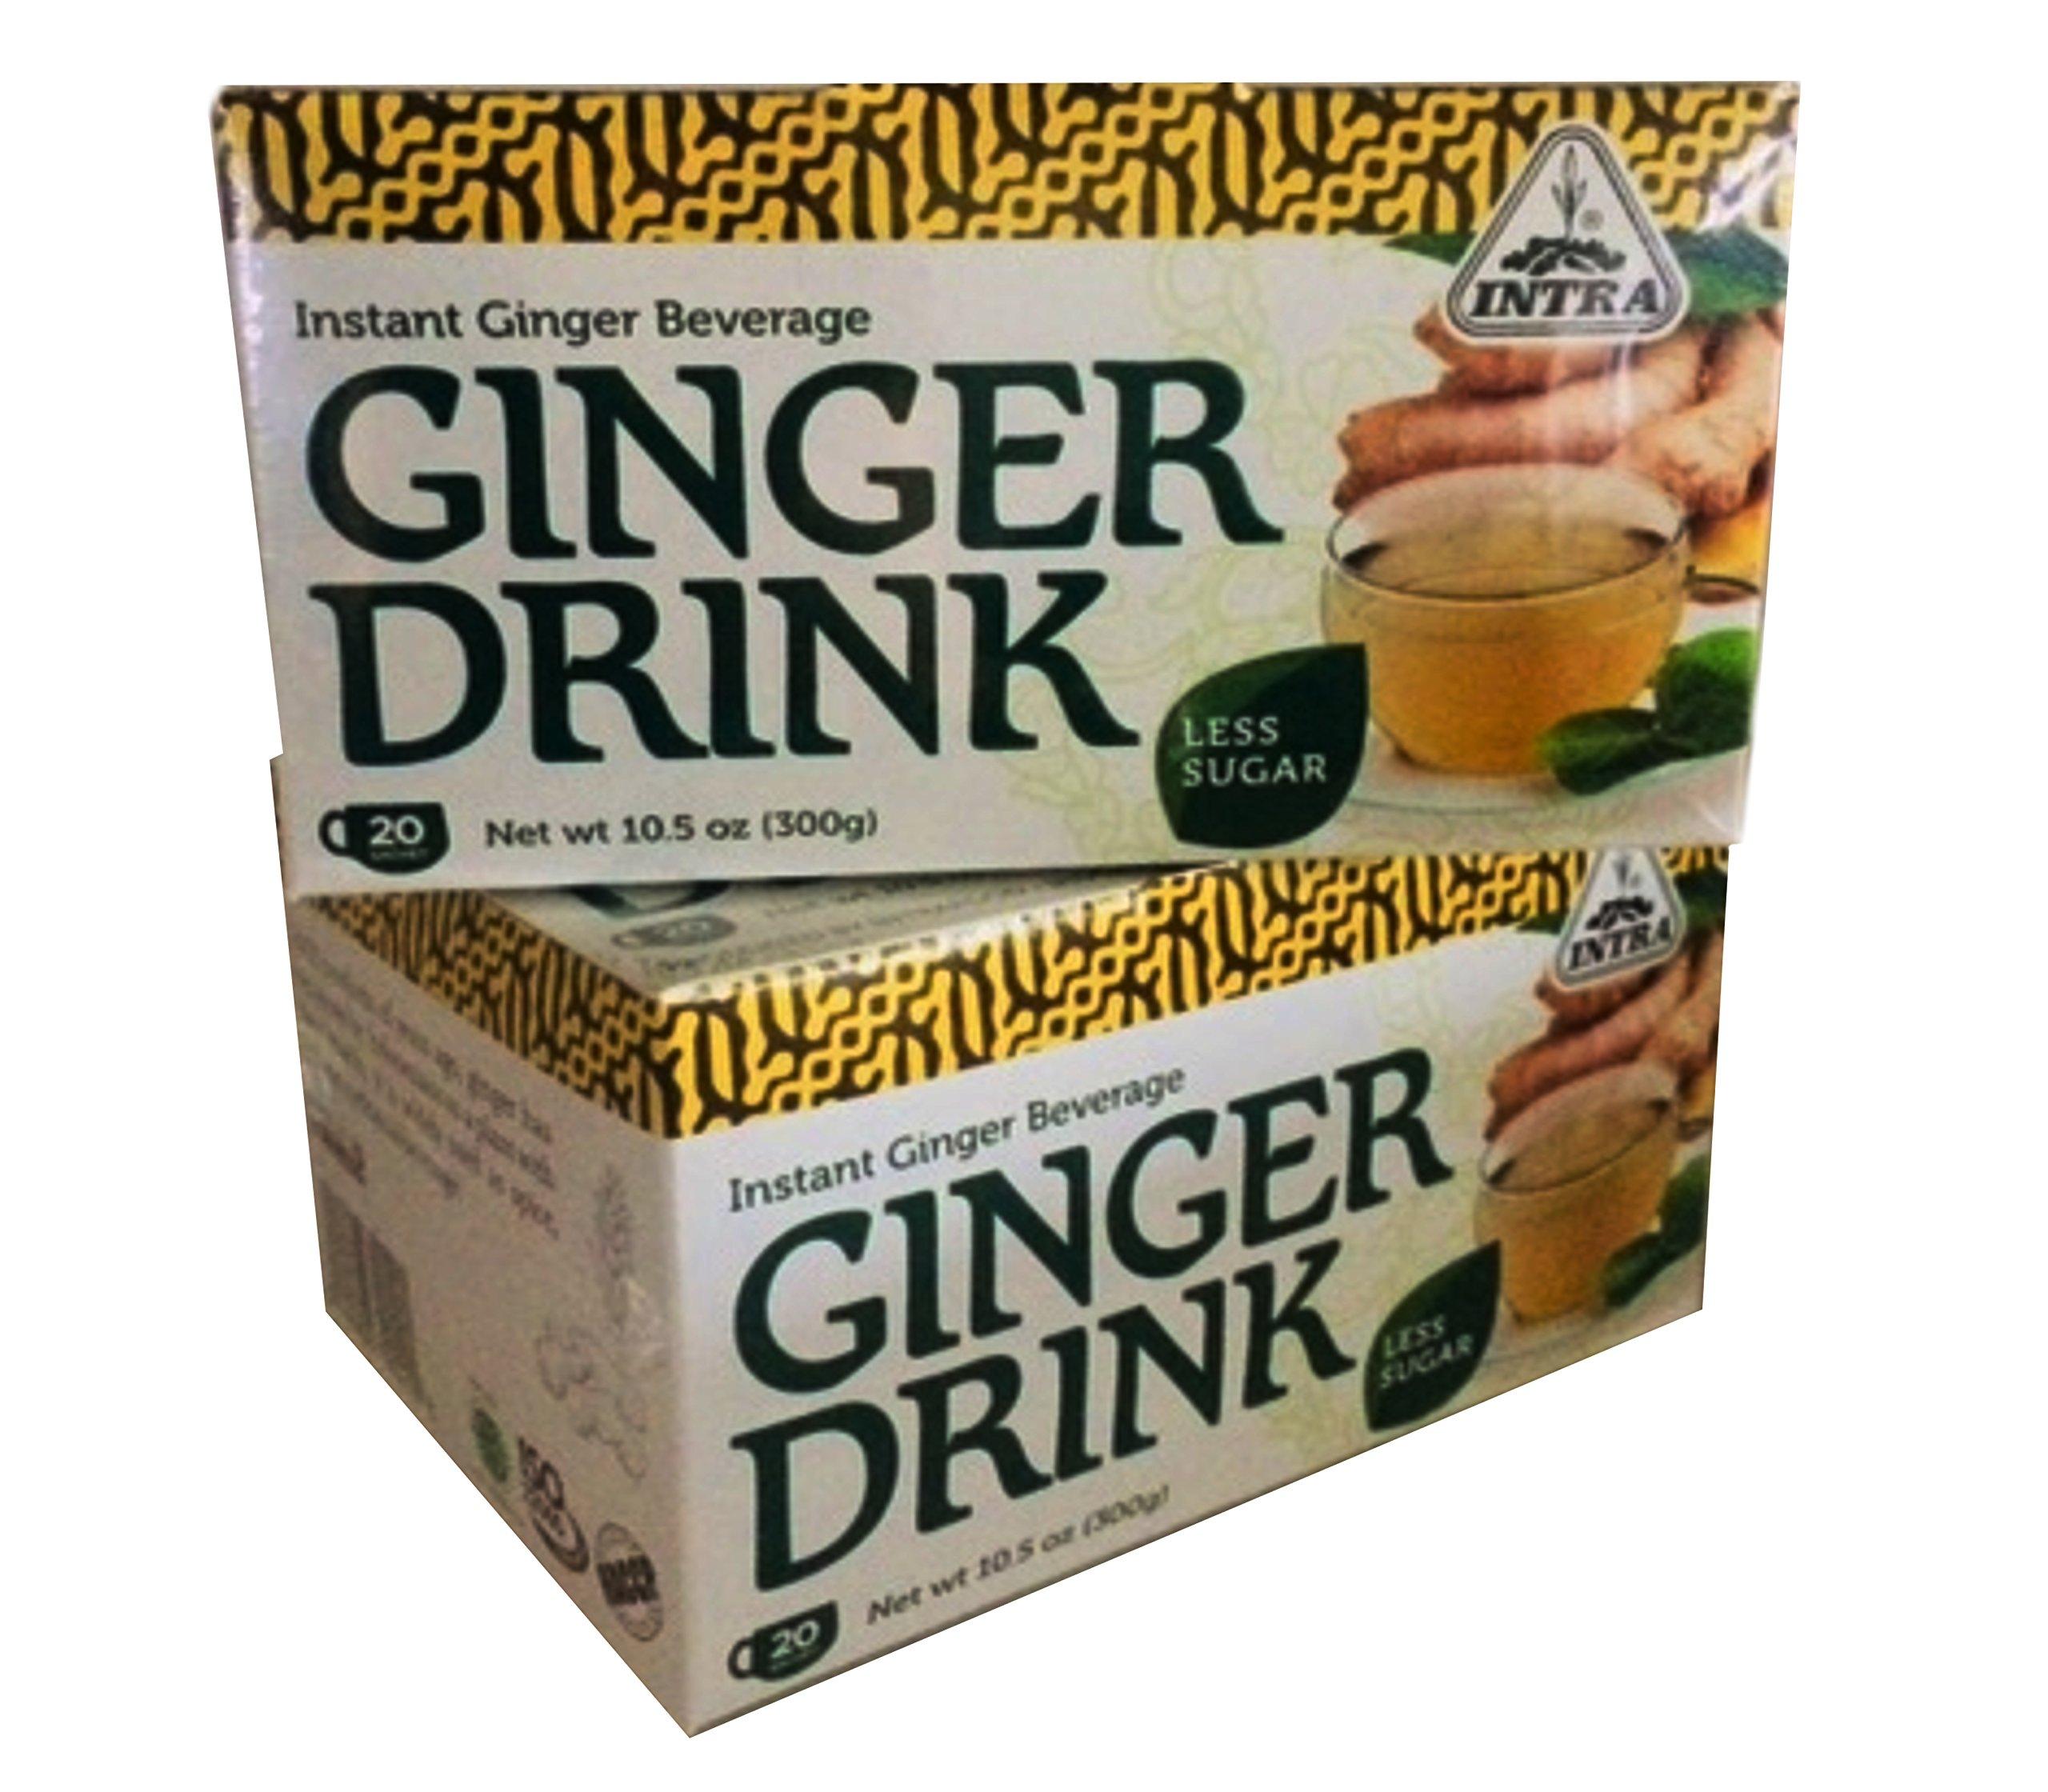 Intra Intant Ginger Drink Less Sugar, 10.5oz, 20-sachet per pack, (Pack of 2)